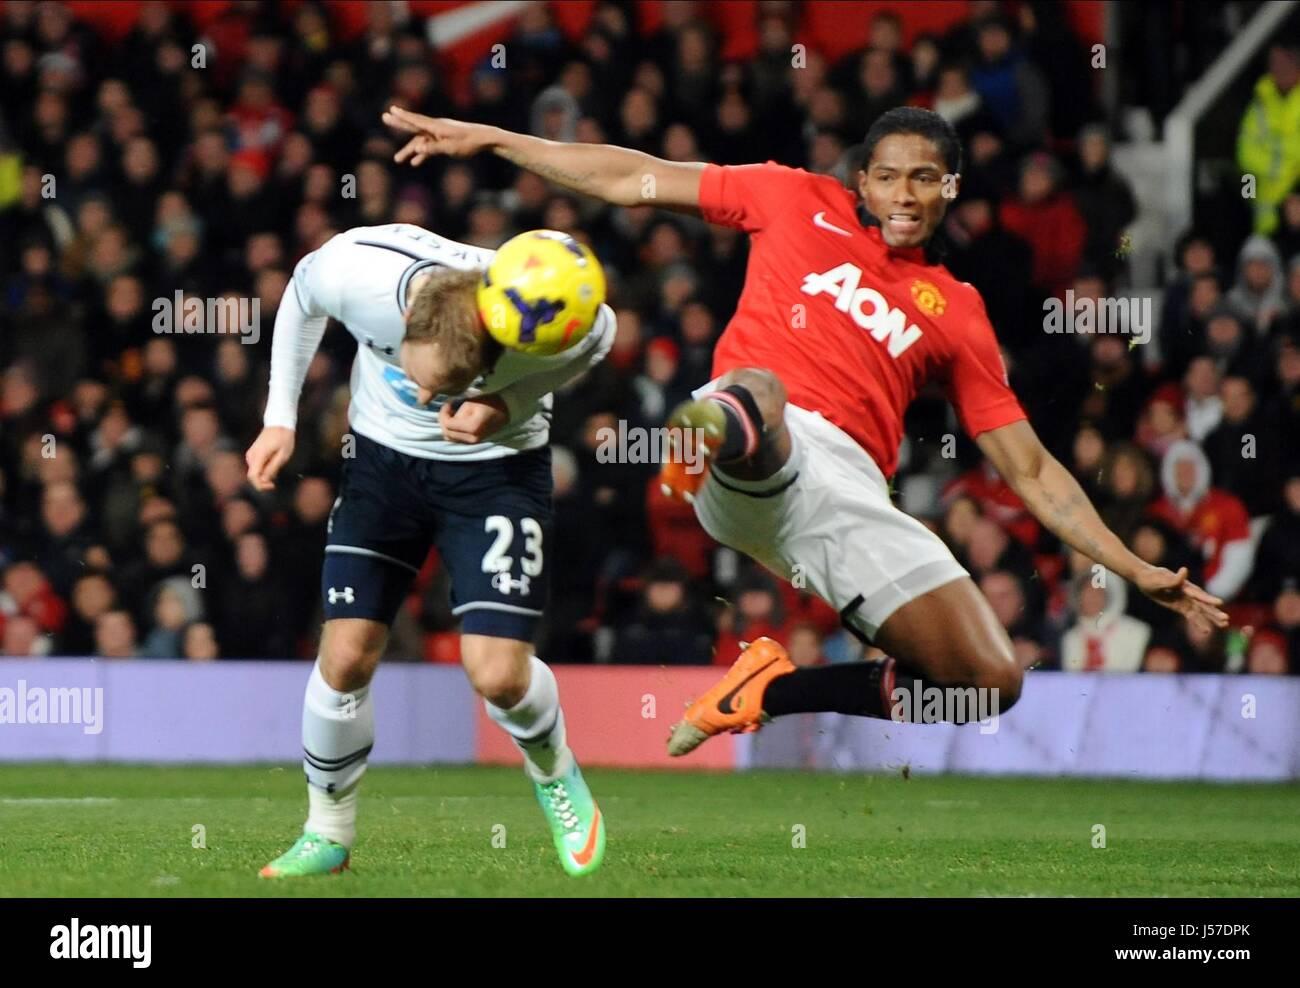 CHRISTIAN ERIKSEN SCORES 0.2 MANCHESTER UNITED FC V TOTTENH OLD TRAFFORD MANCHESTER ENGLAND 01 January 2014 - Stock Image